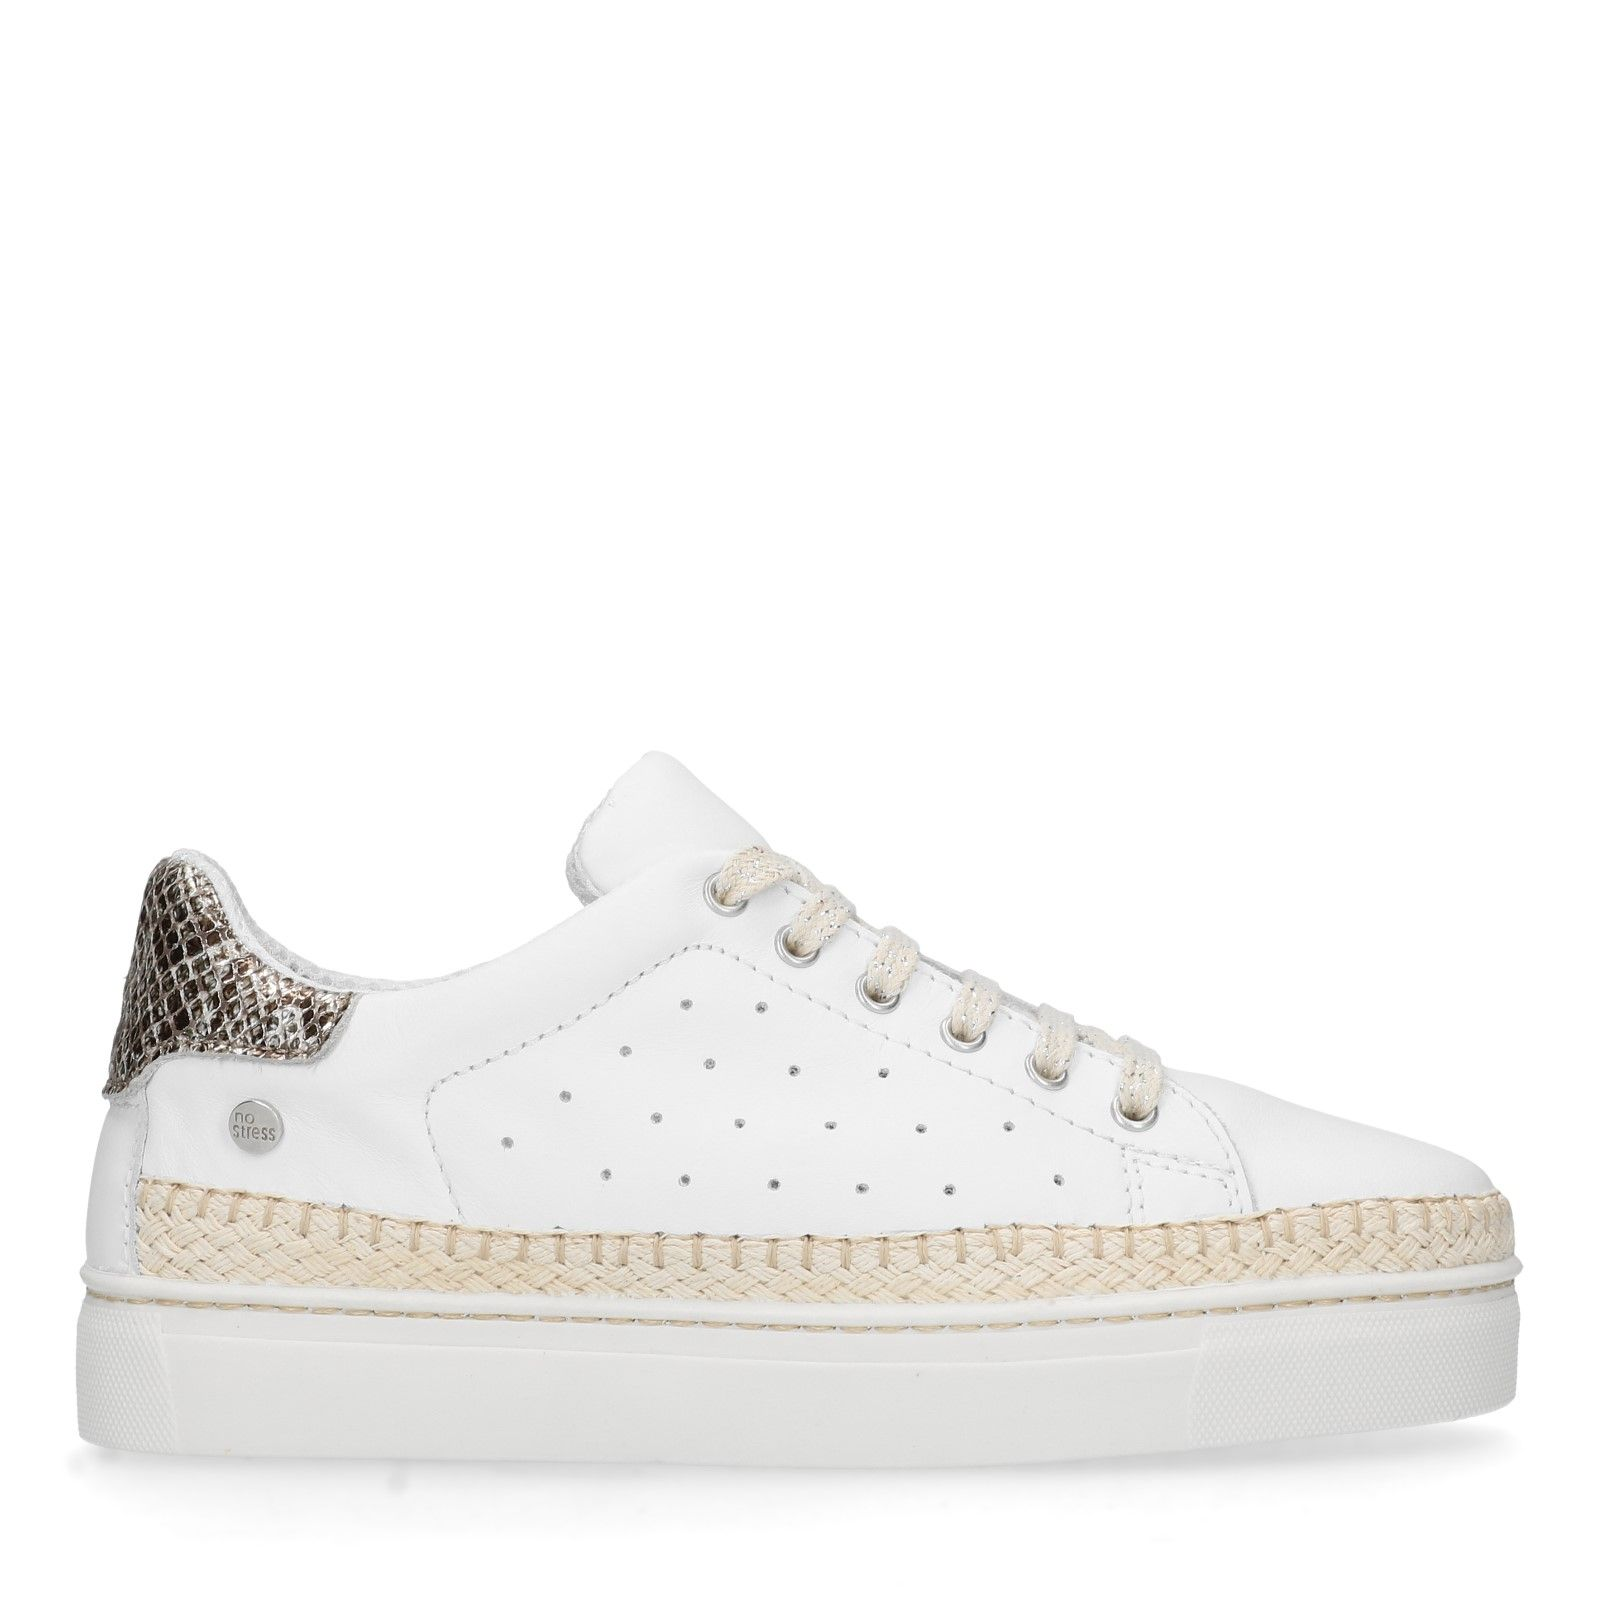 1d9a21cc761d17 Weiße Sneaker mit Kontrast-Details